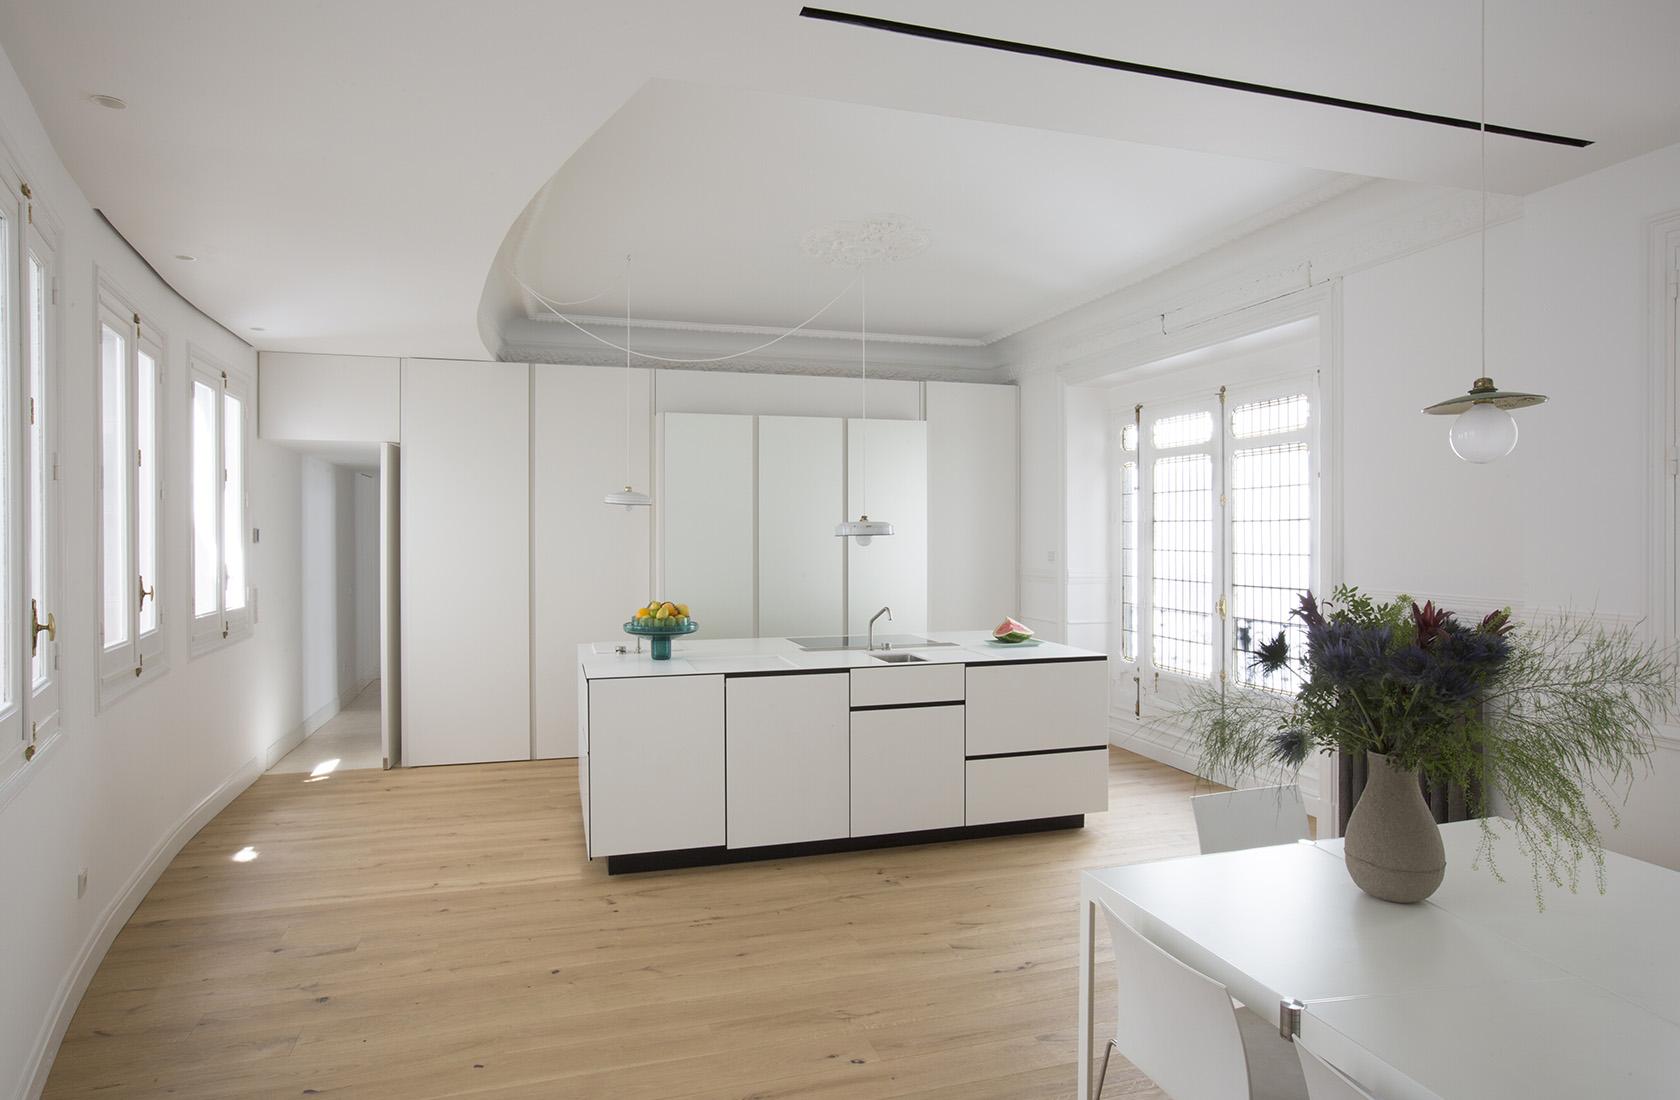 Cocina con ventanal rehabilitado, reforma integral Sagasta